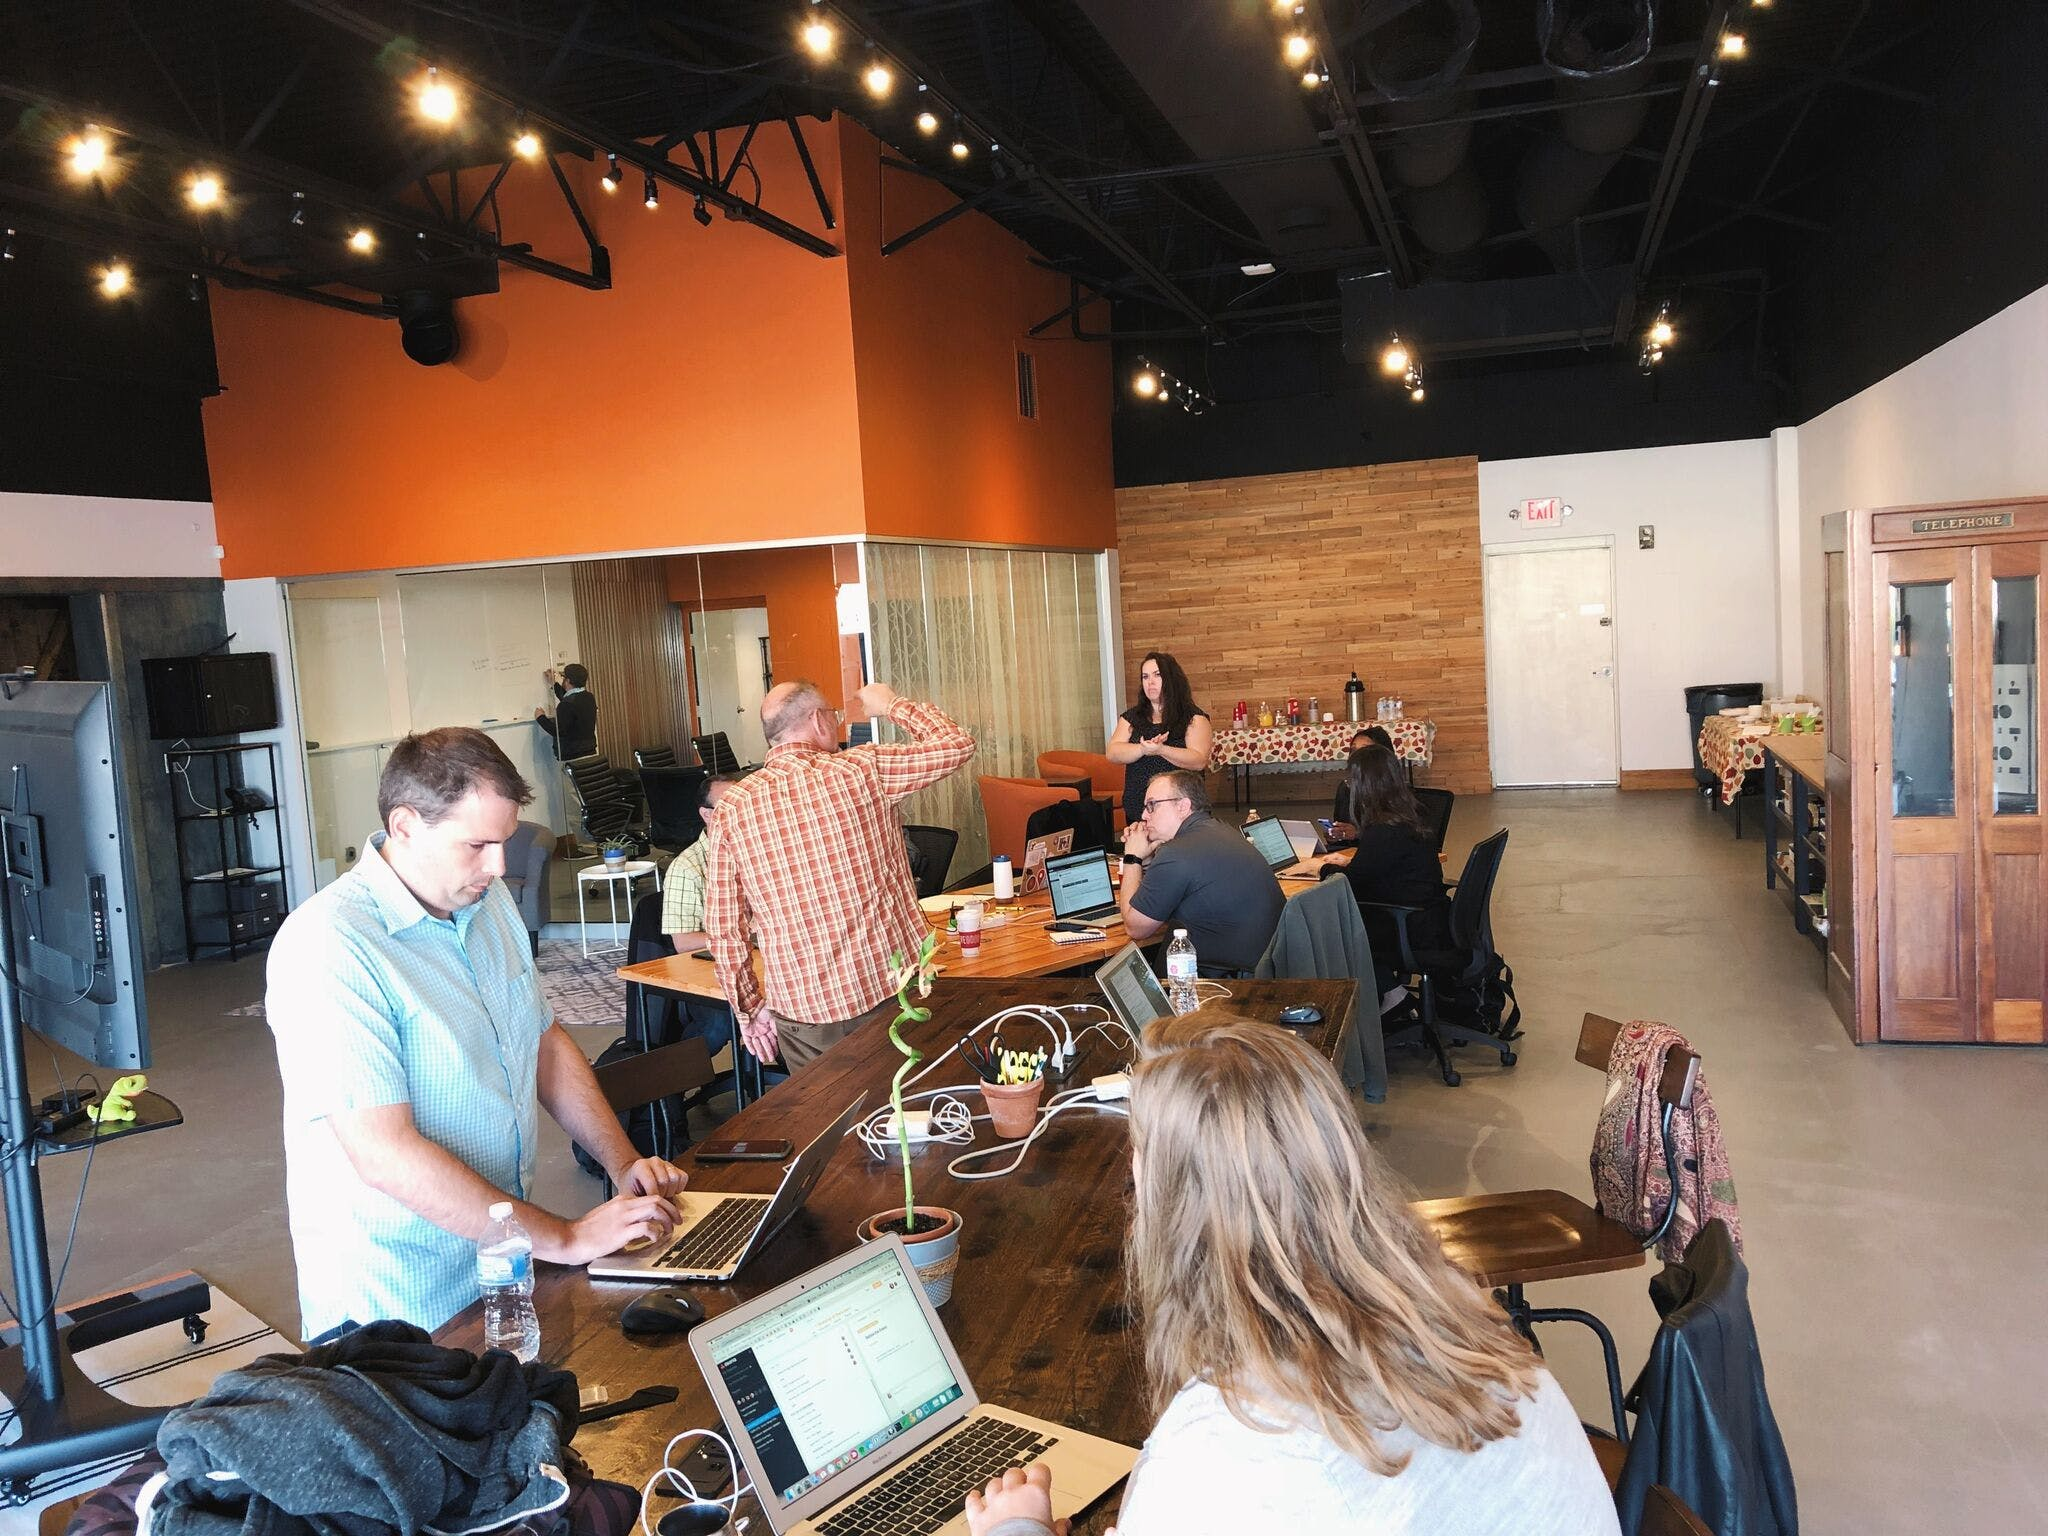 The Reclaim Hosting team at work